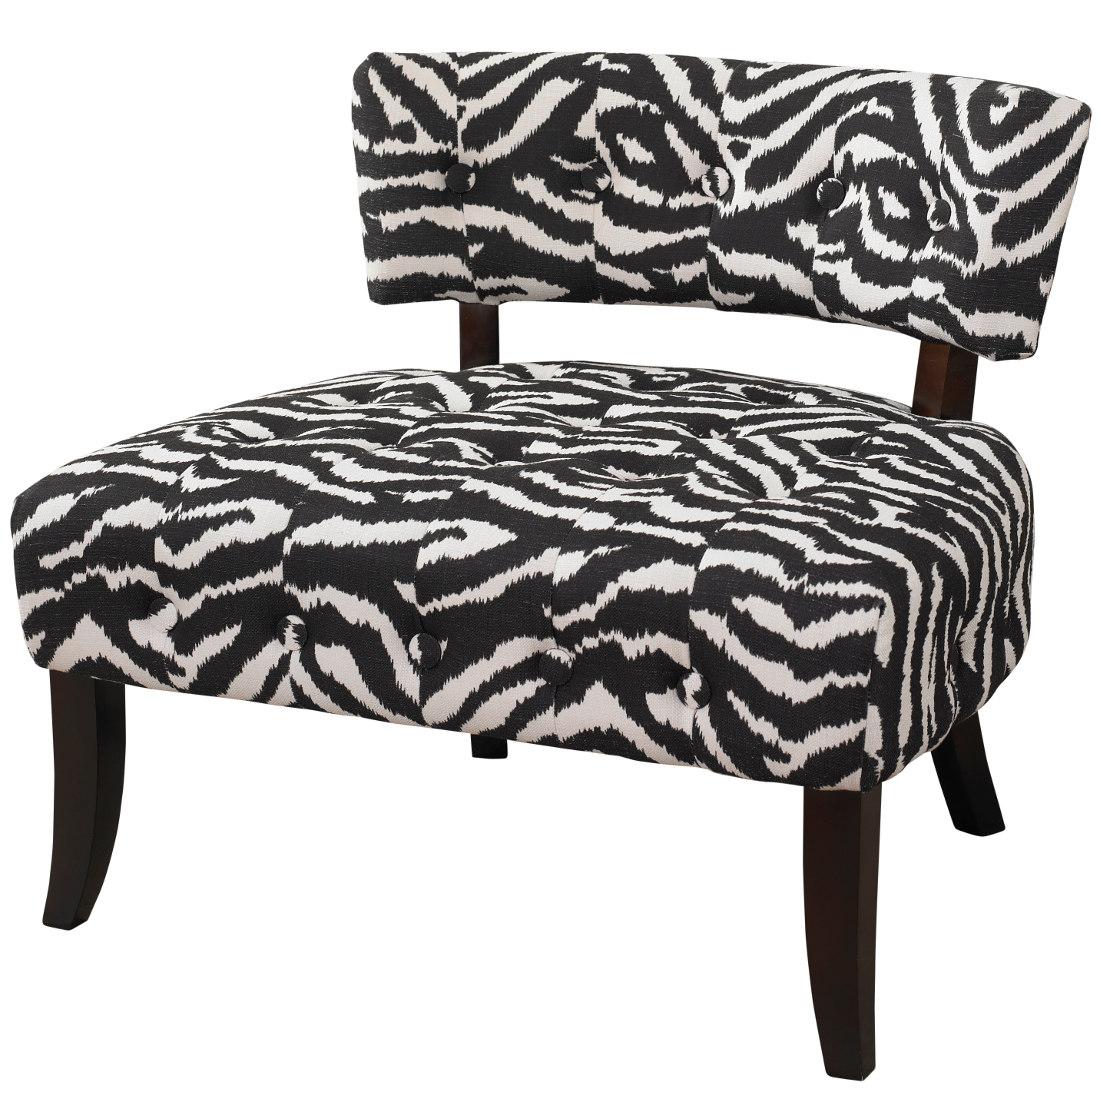 Affordable Accent Chairs Decor Ideasdecor Ideas